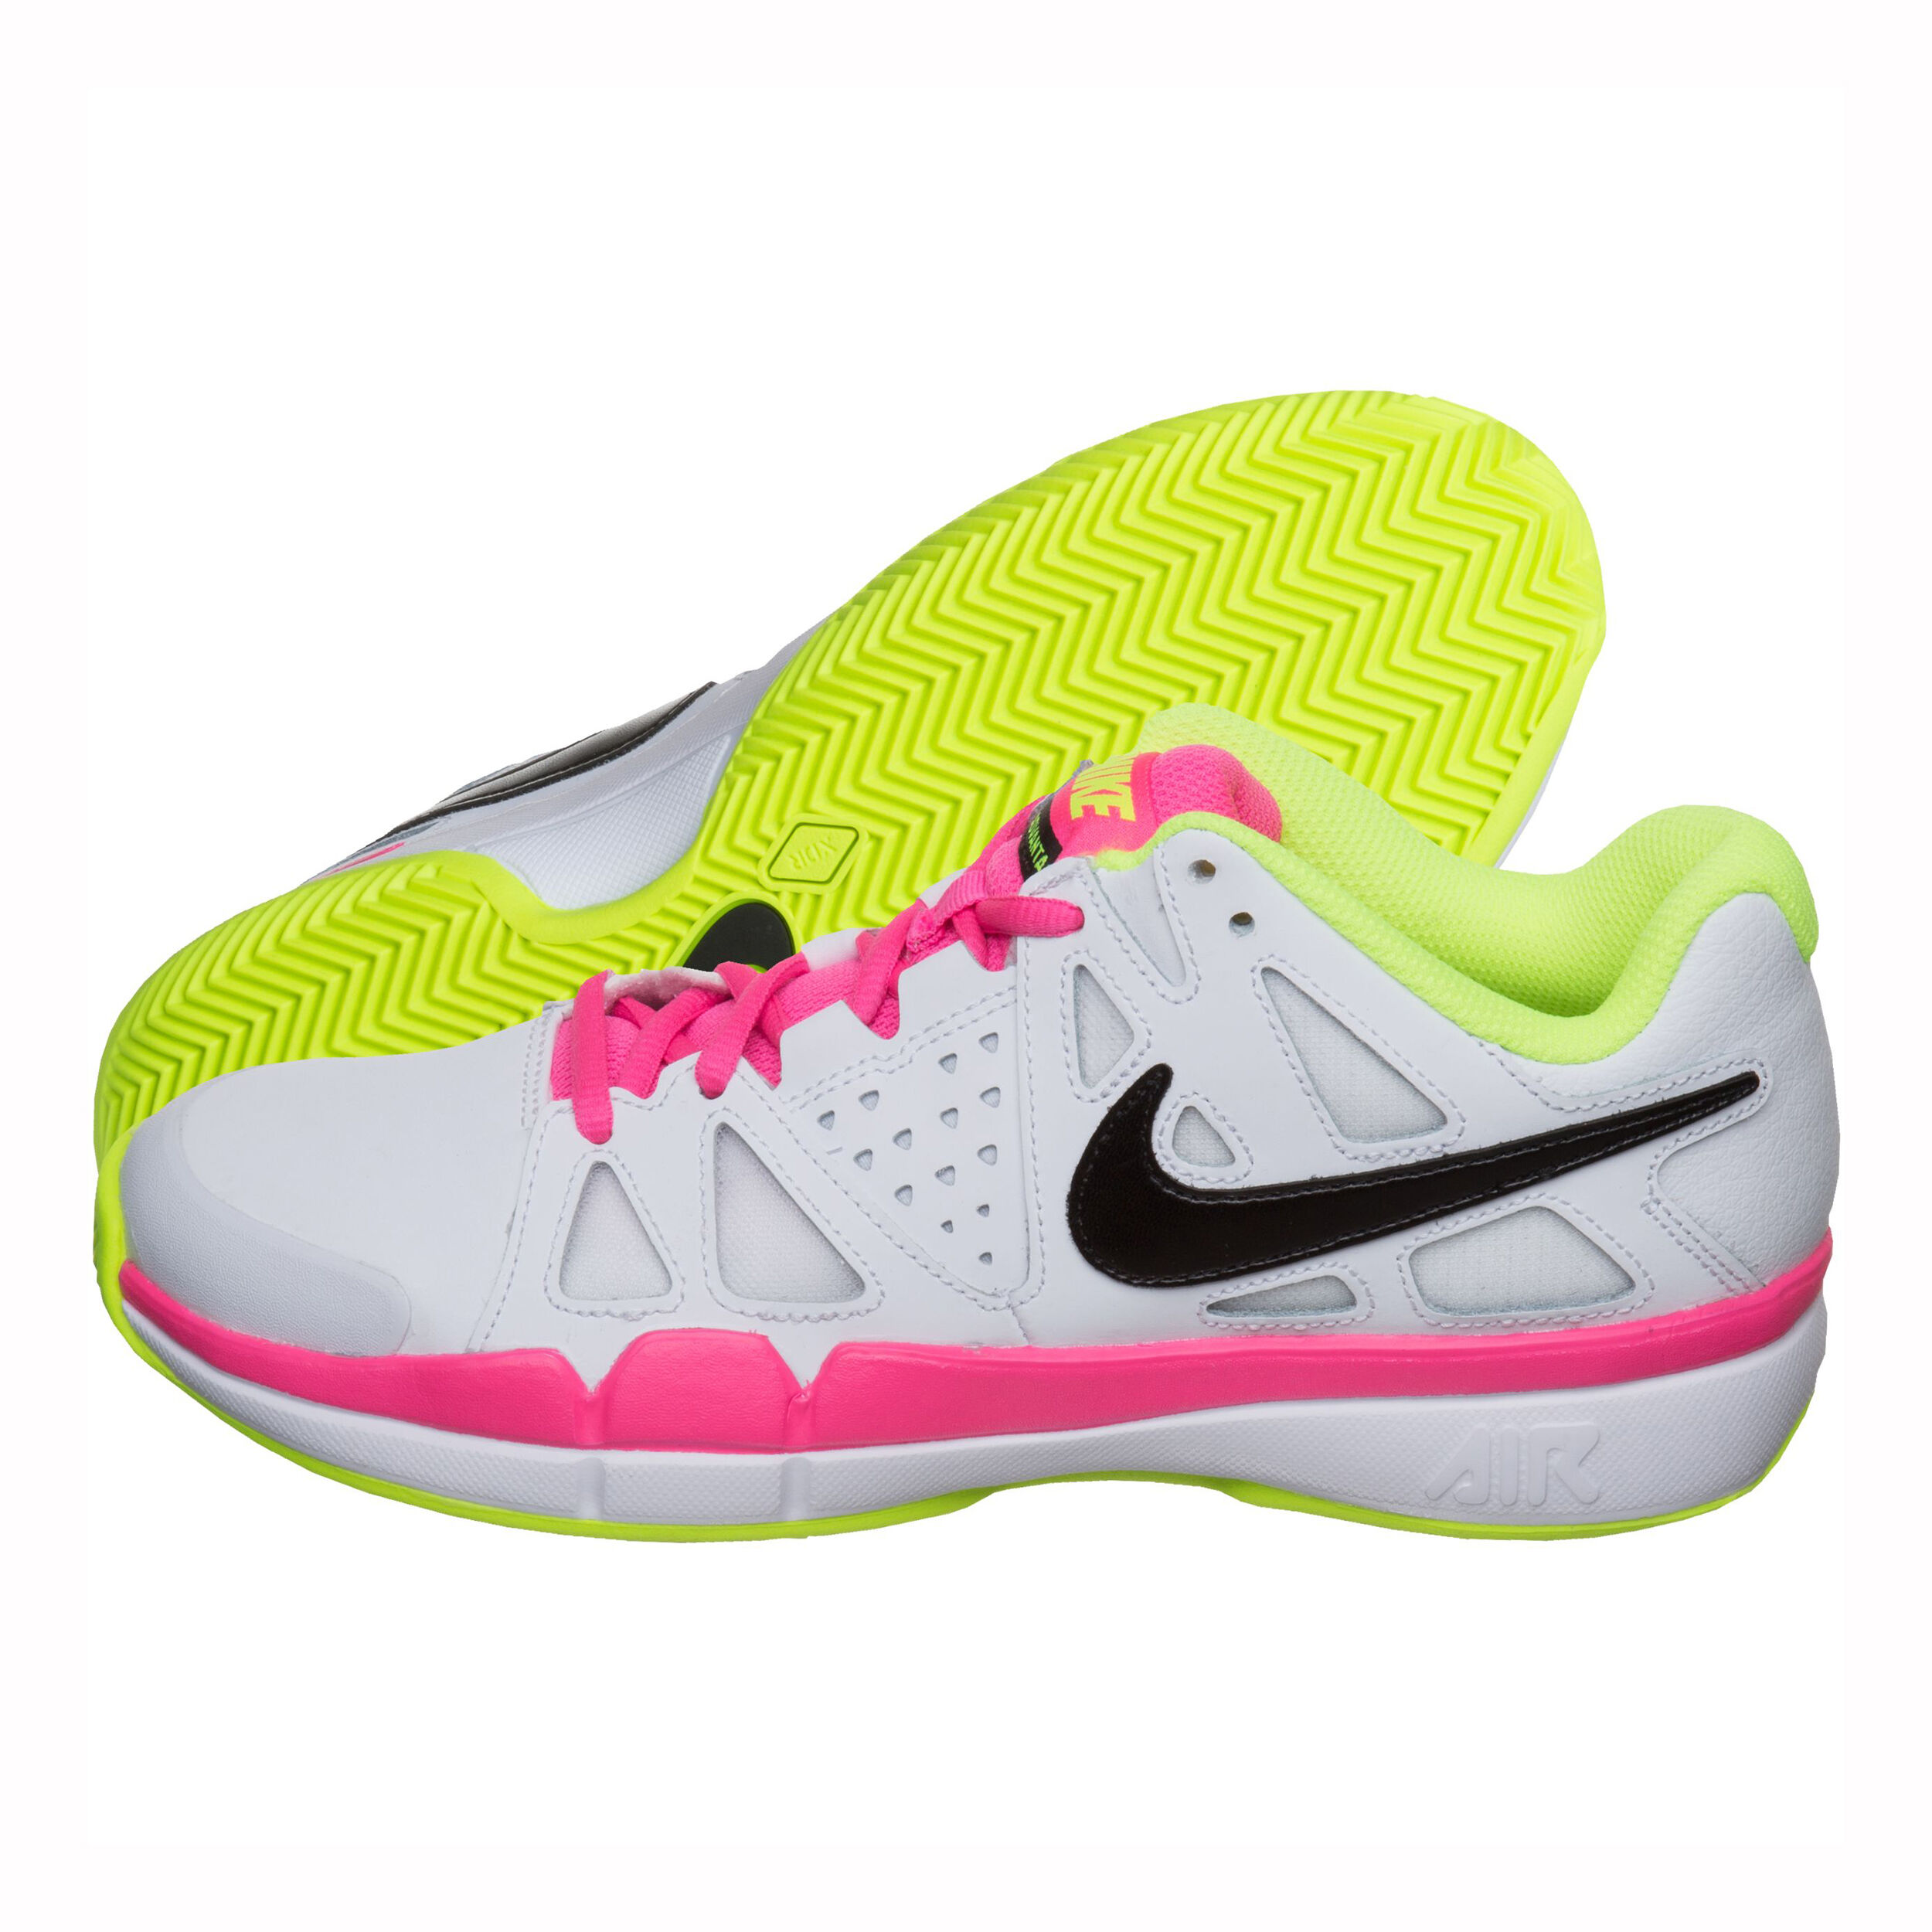 Nike Womens Vapor Advantage Clay Tennis